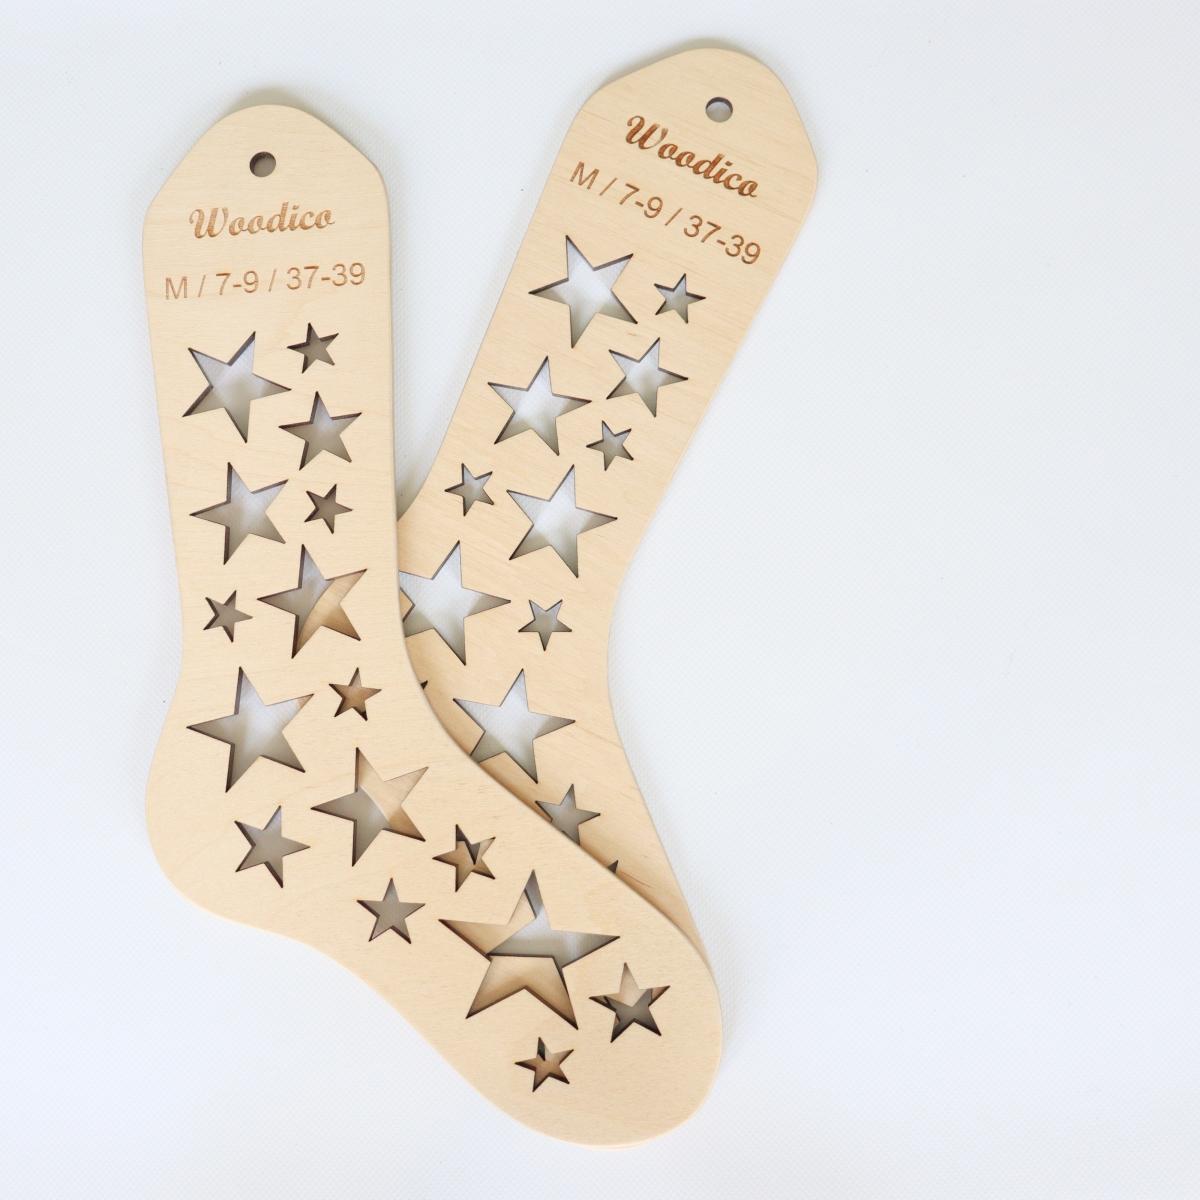 woodico.pro wooden sock blockers stars 9 1200x1200 - Wooden sock blockers / Stars